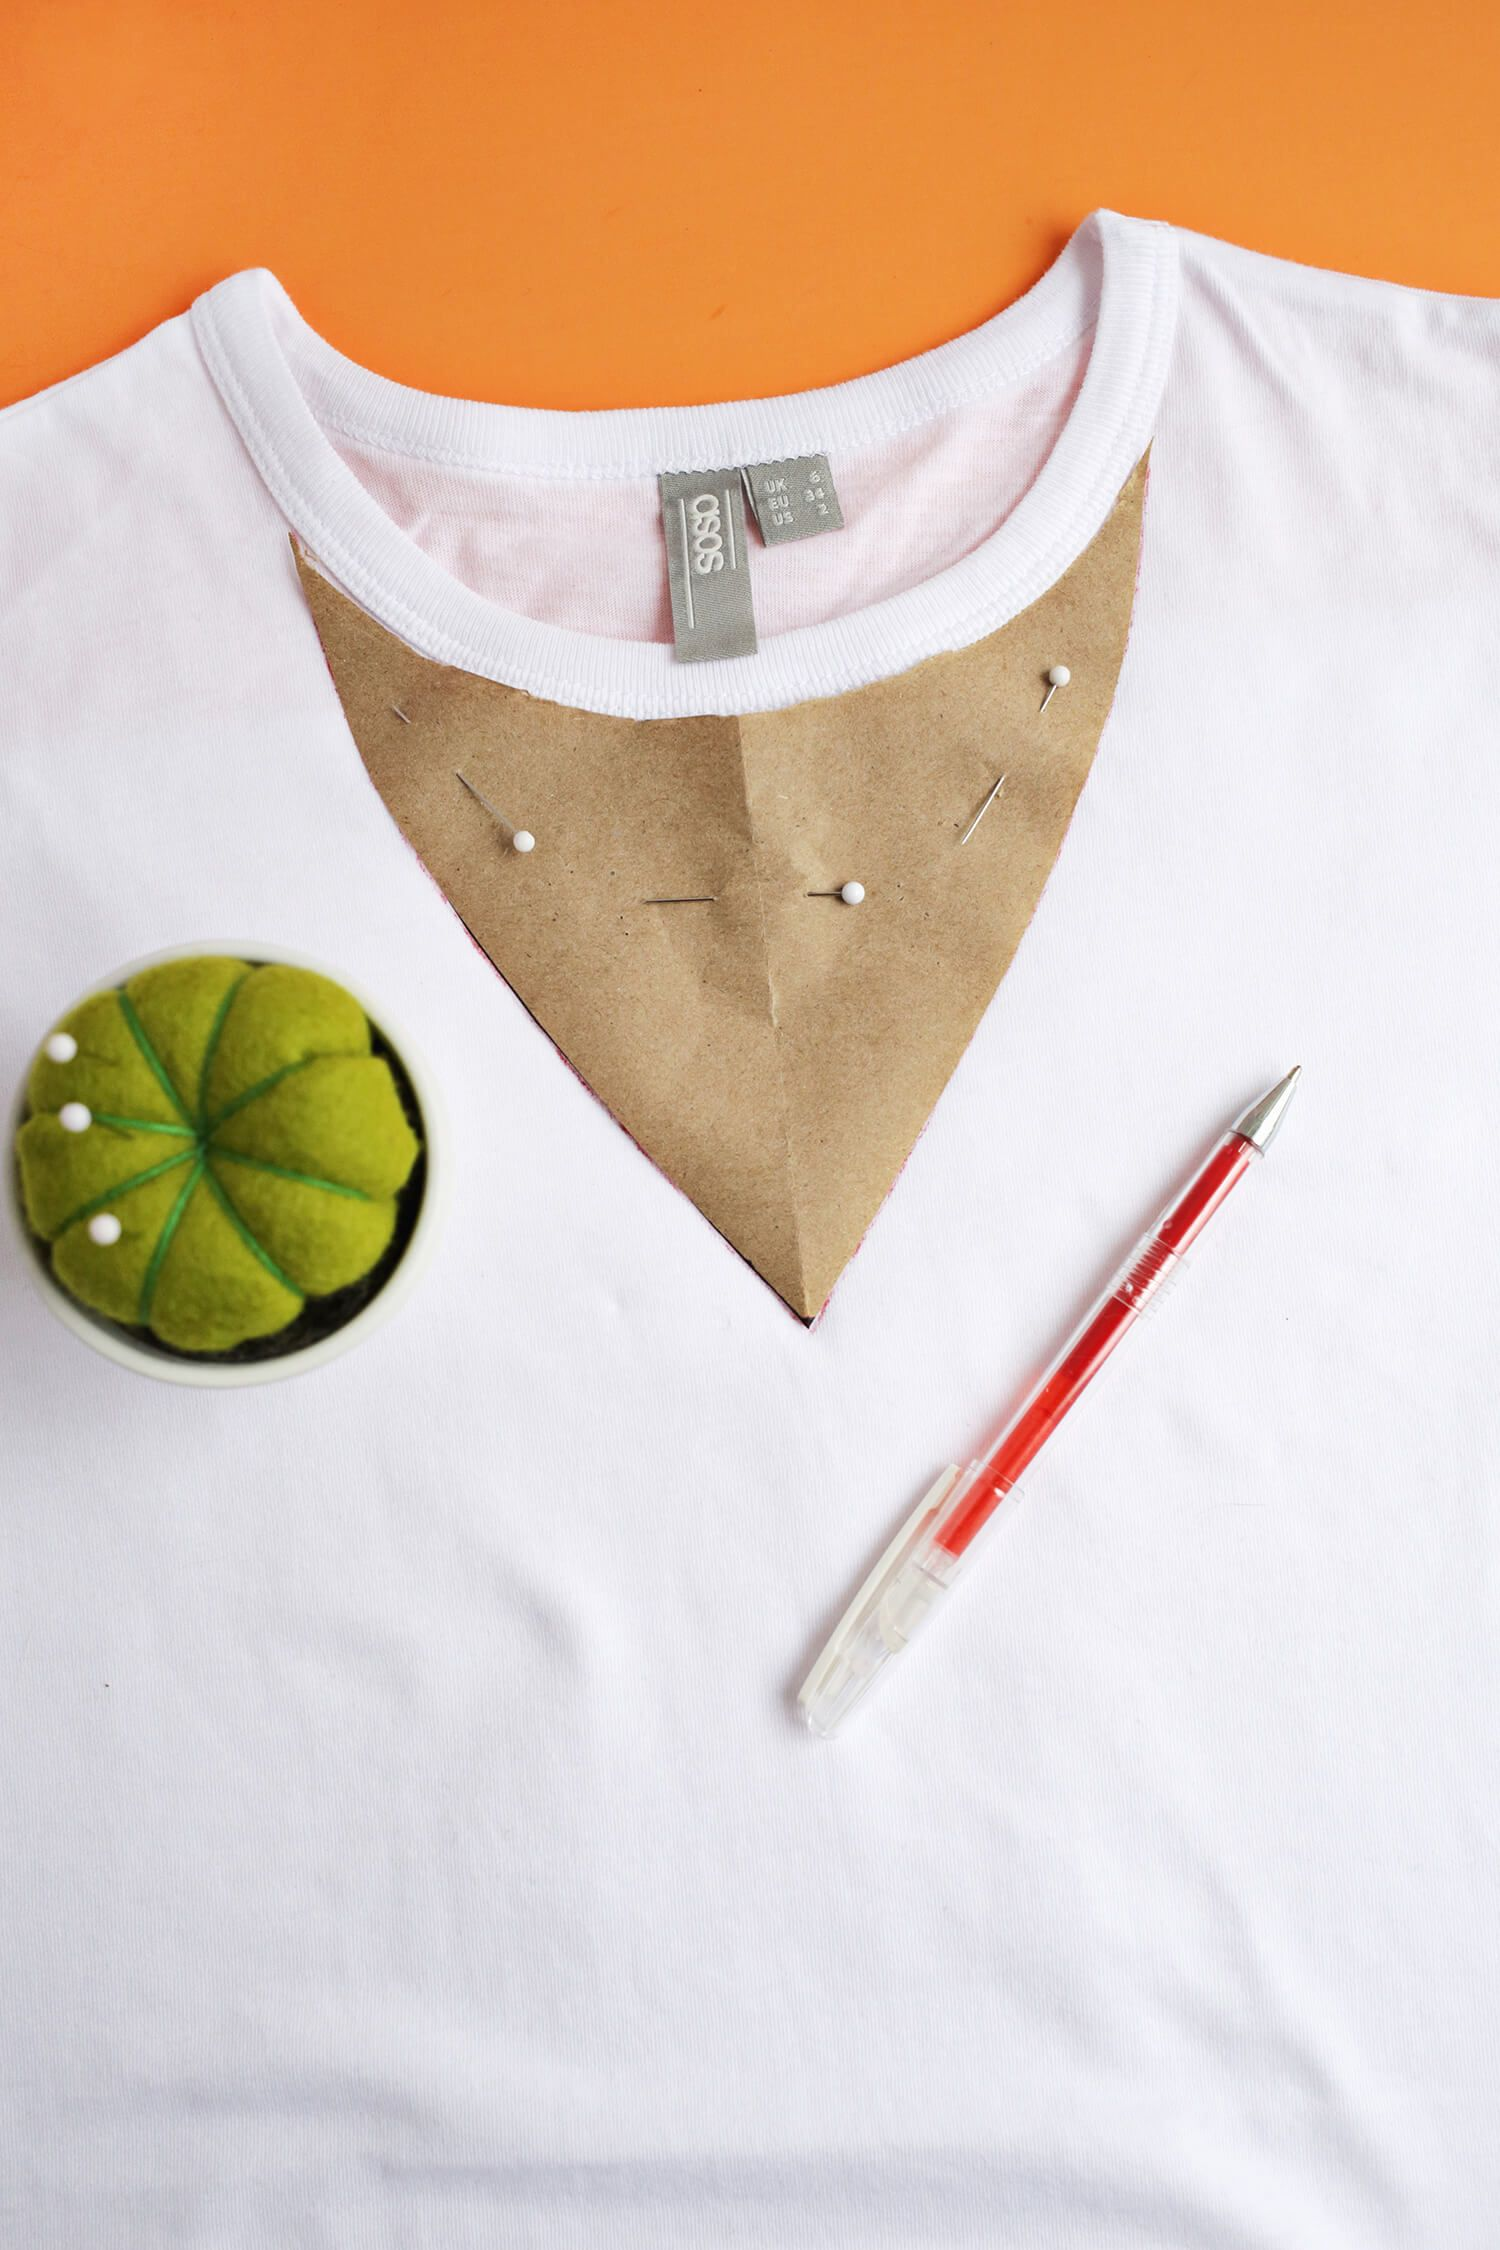 Easy Choker T Shirt Diy Diy T Shirts ändern Diy Kleidung Und